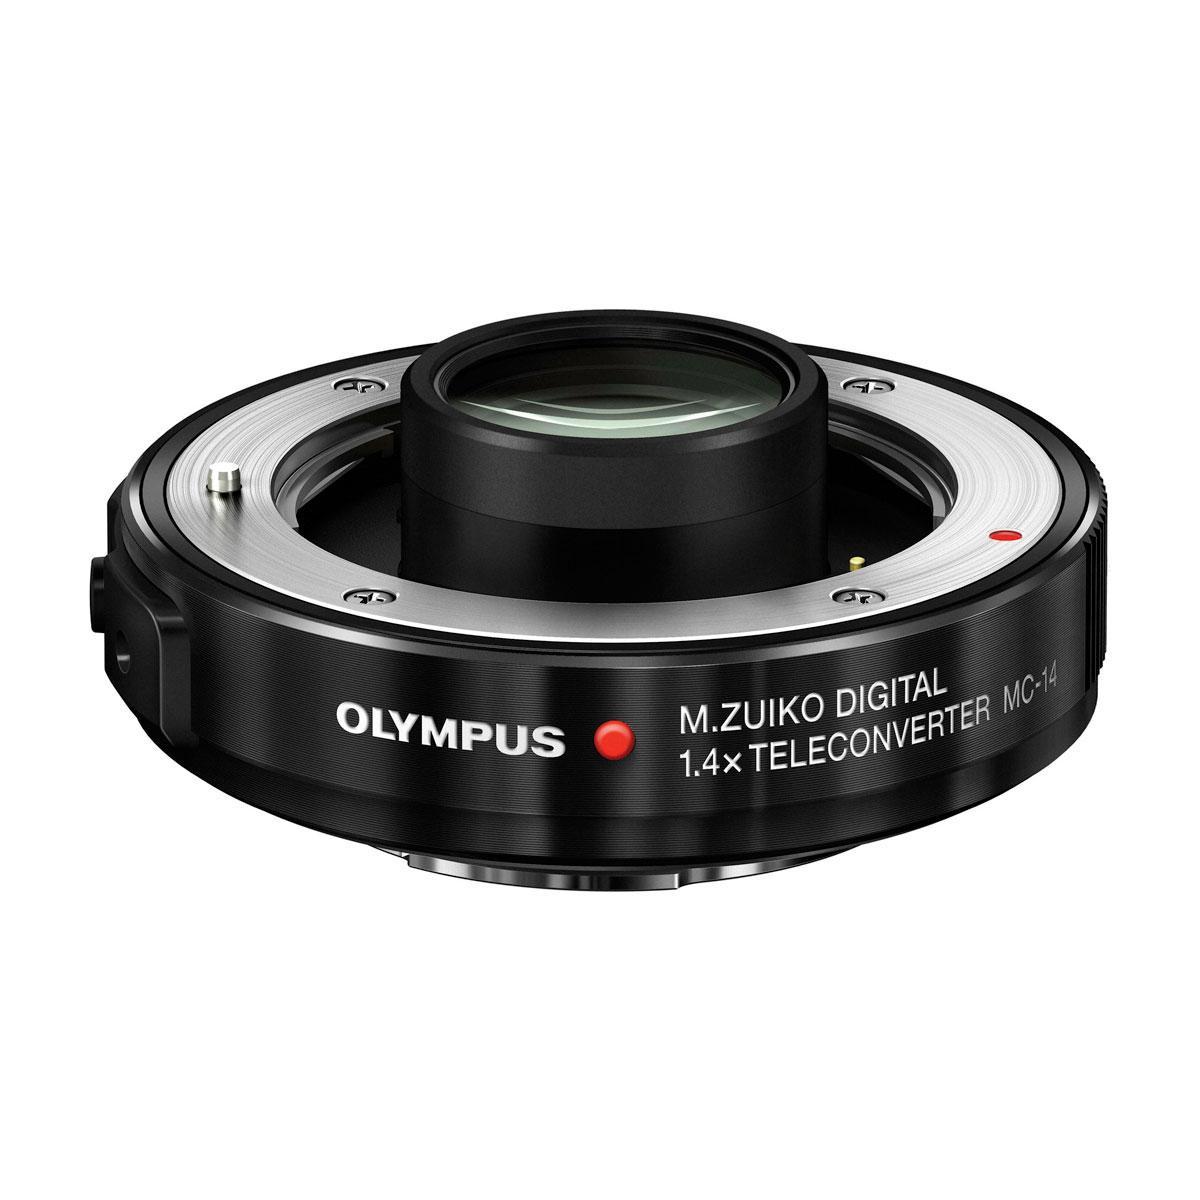 Olympus MC1.4x telejatke (40-150/2.8 kanssa)